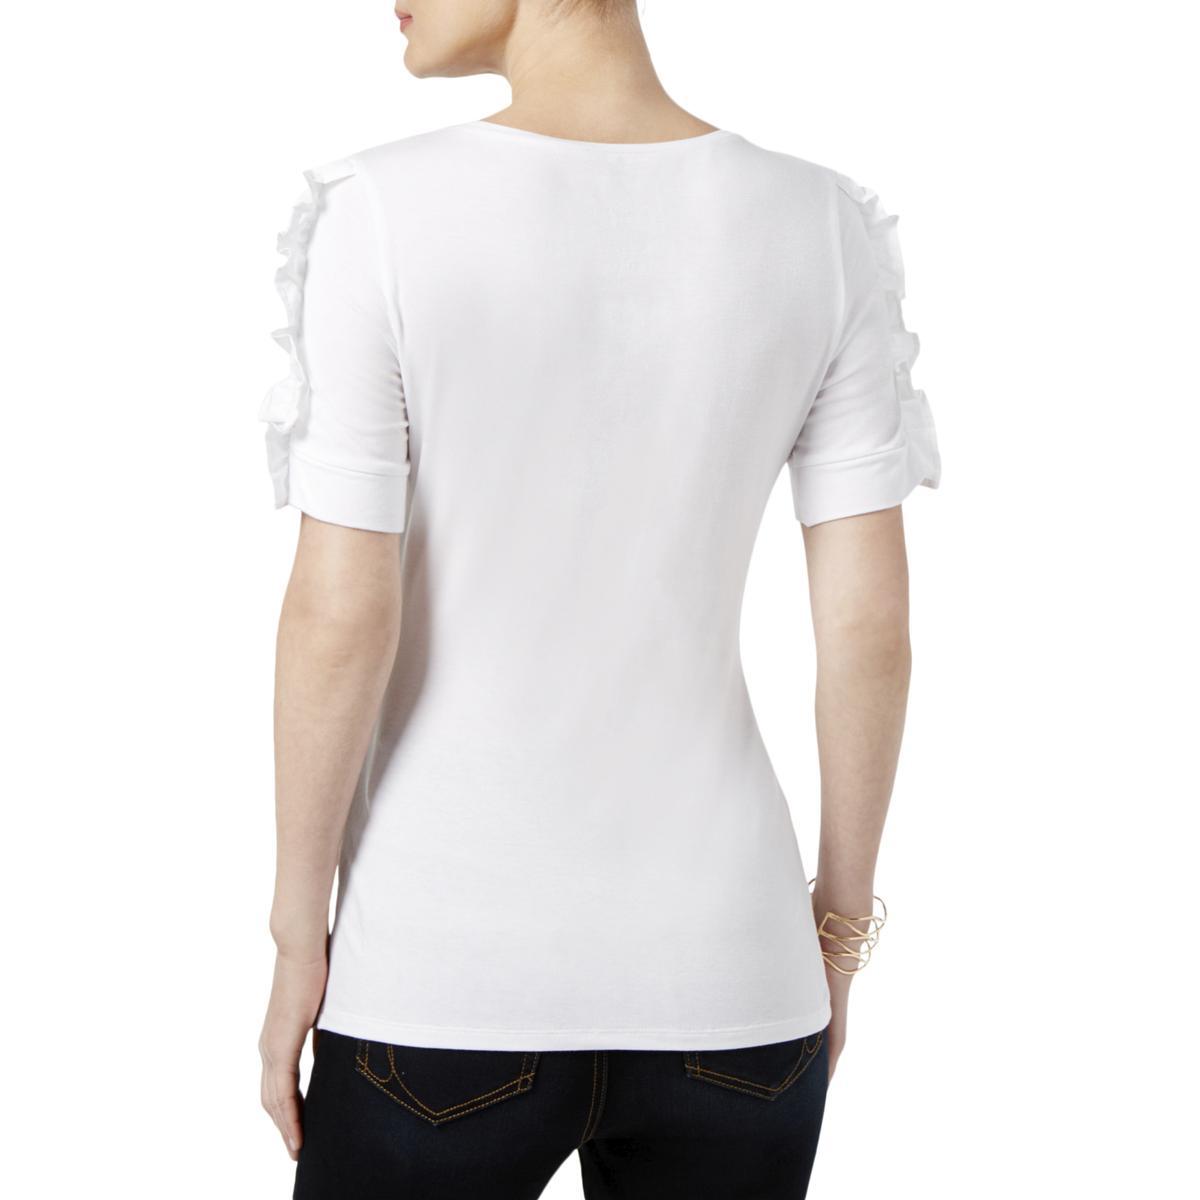 4edfdb0d INC Womens White Ruffled Short Sleeves Scoop Neck Casual Top Shirt L ...